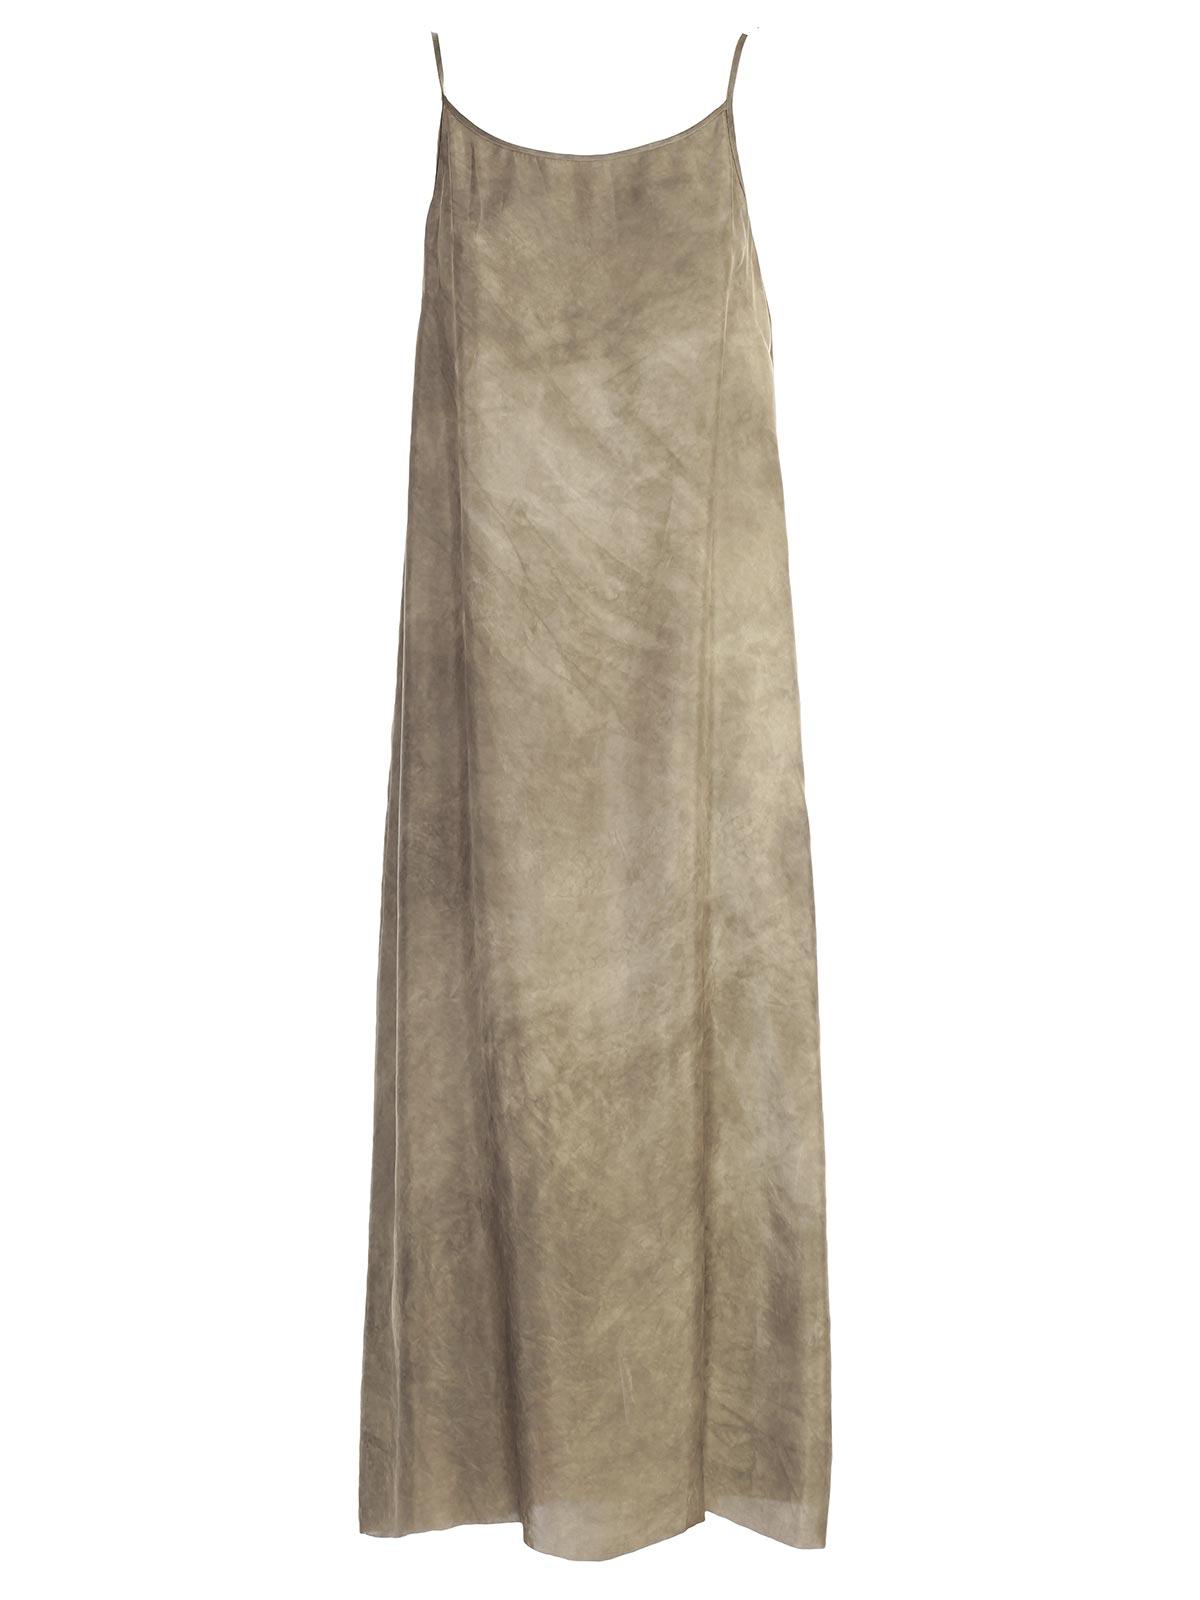 Picture of Uma Wang Dress